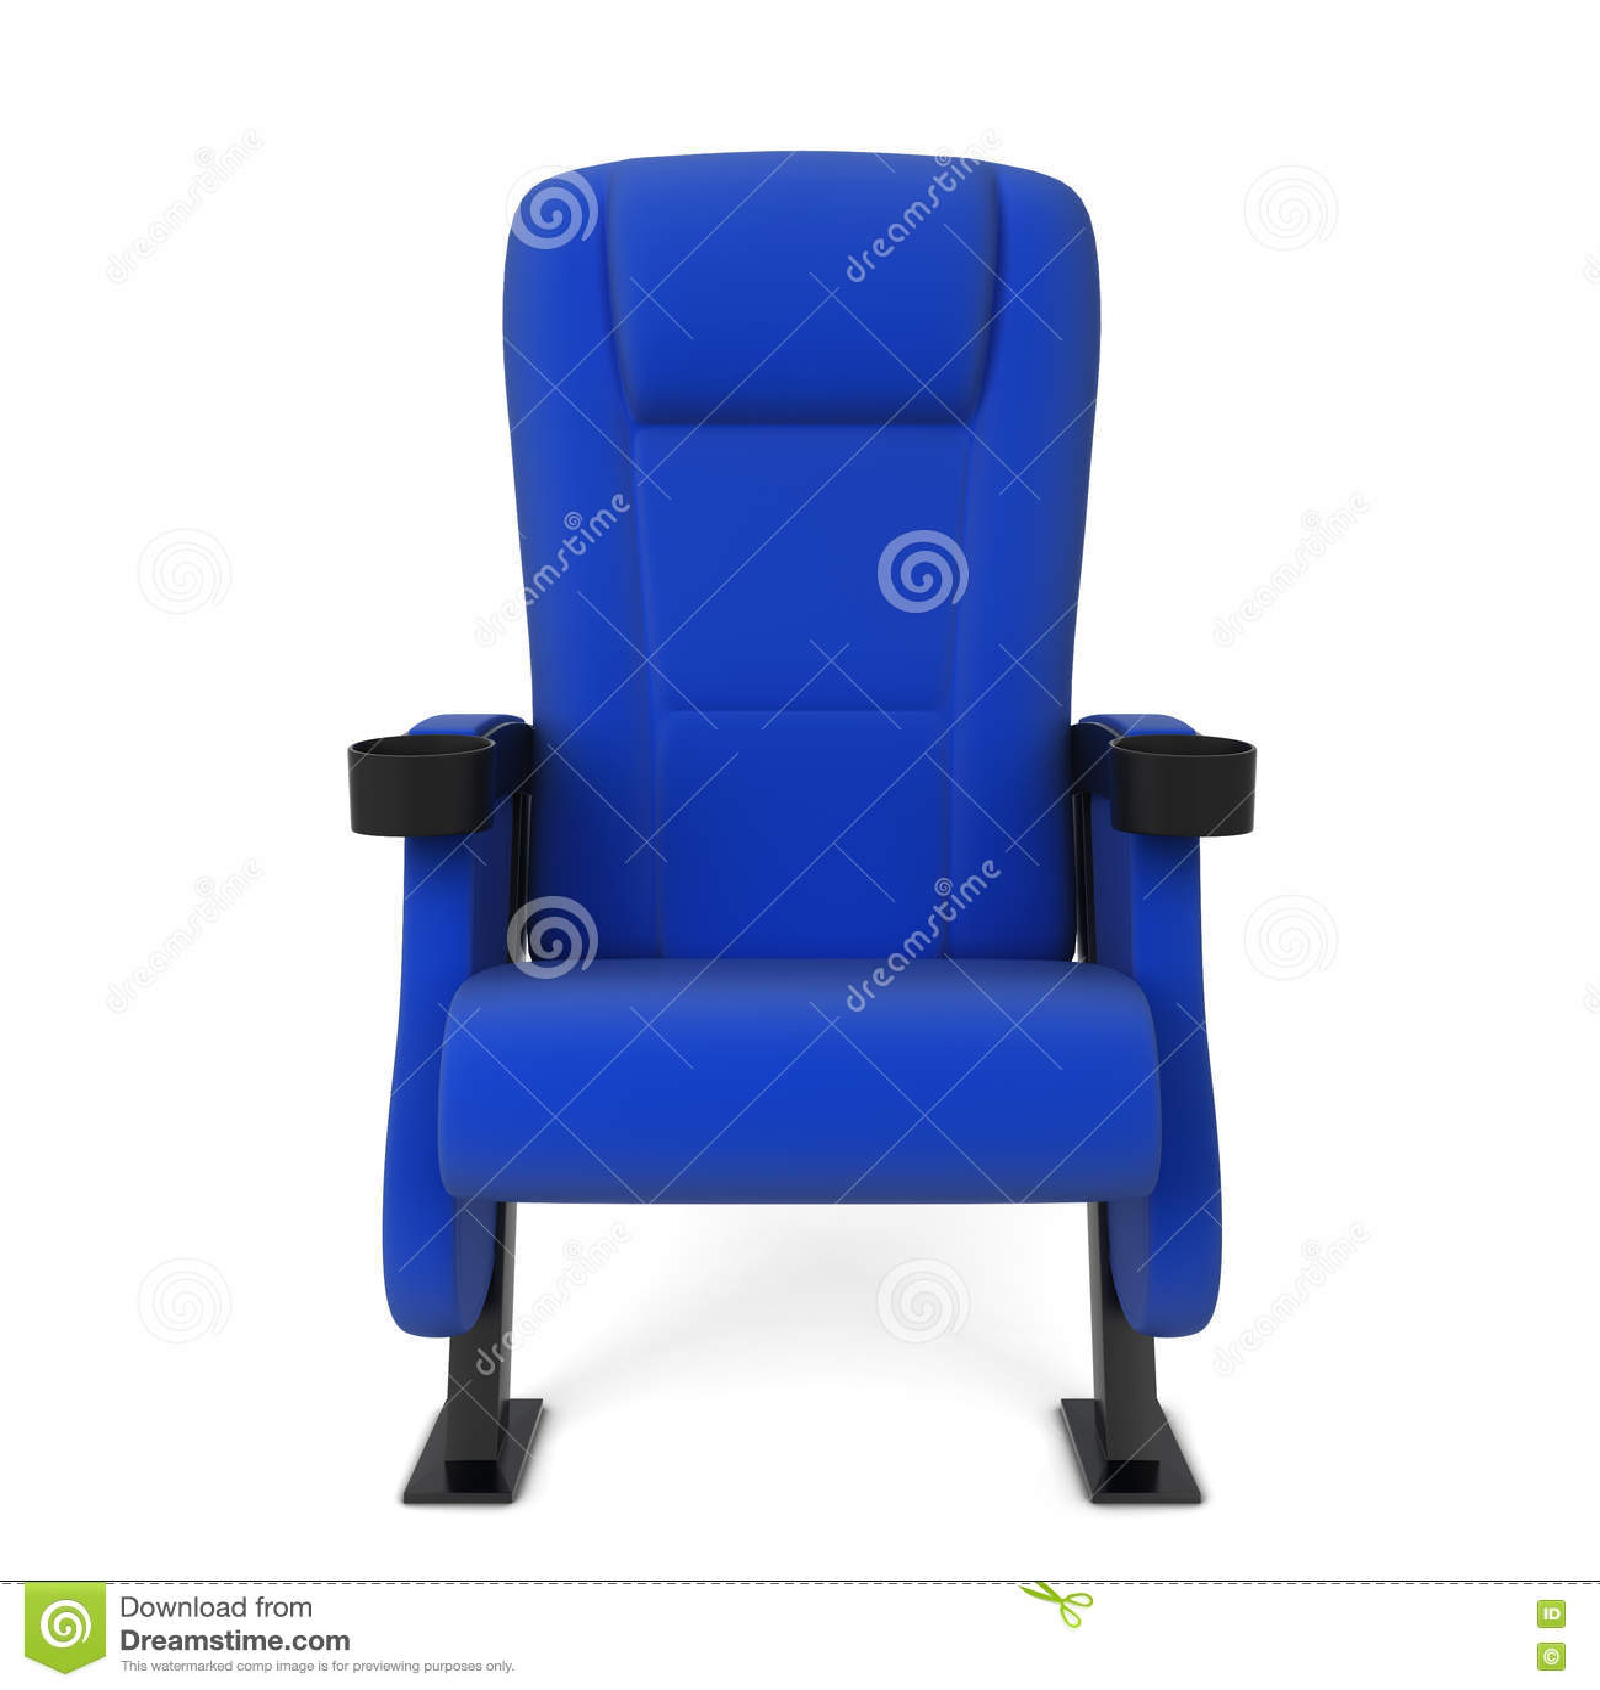 Cinema chair stock illustration  Illustration of armchair - 82210105